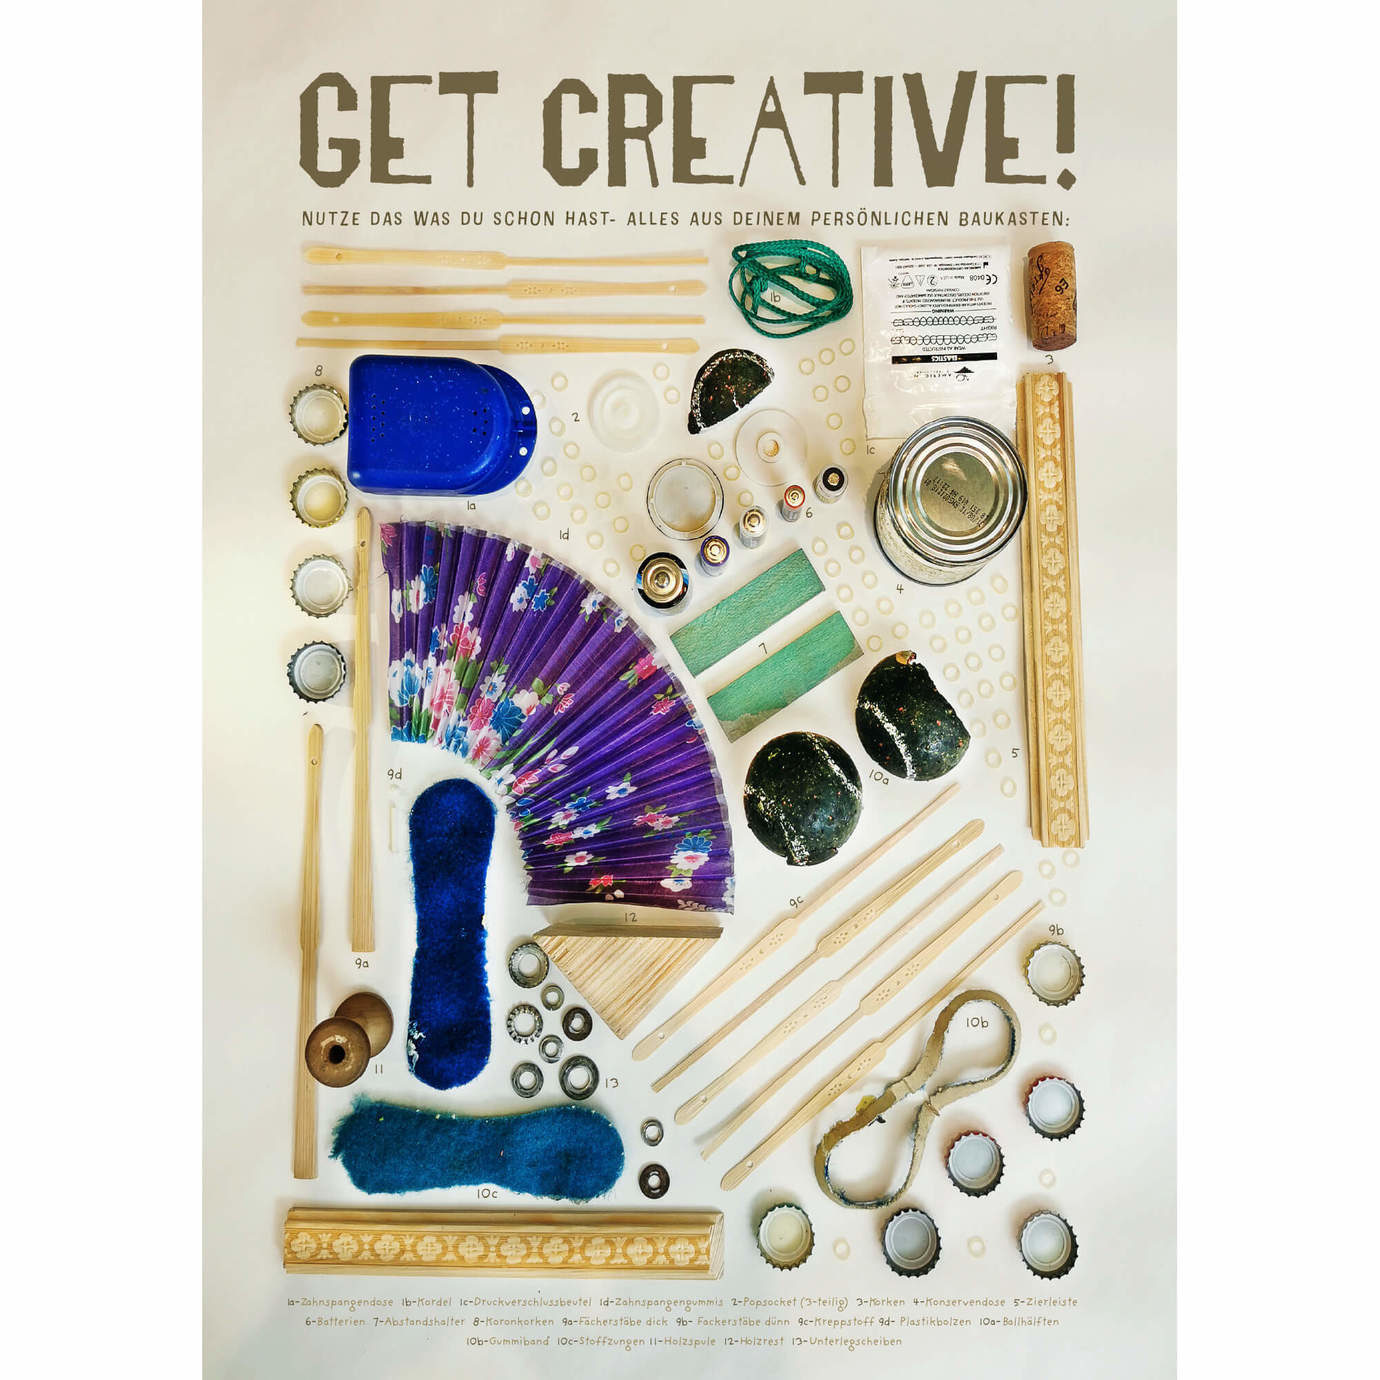 Grafikdesign / Valerie Simanowski